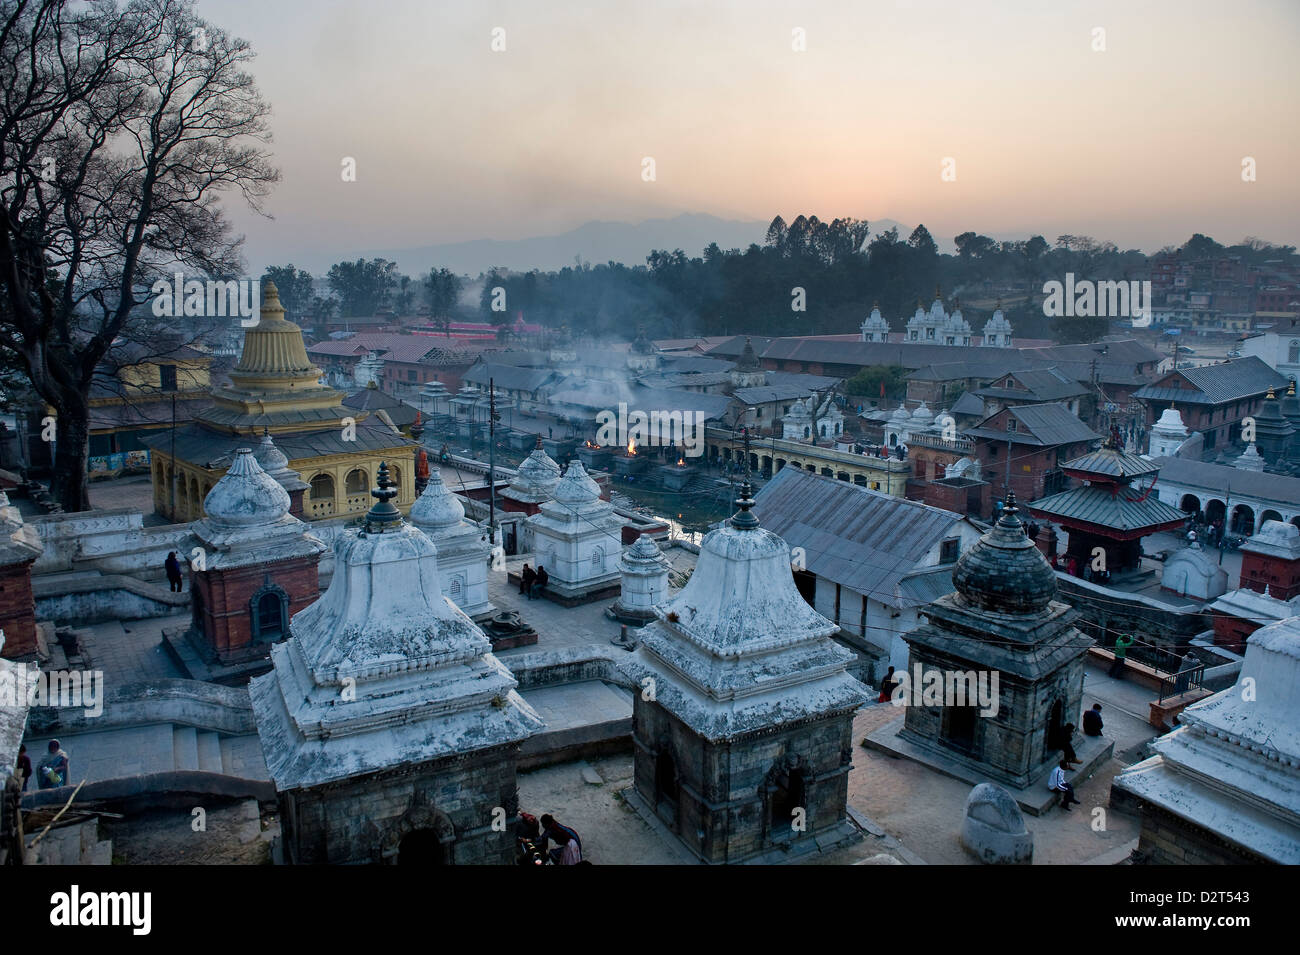 Pashupatinath Temple, UNESCO World Heritage Site, Kathmandu, Nepal, Asia - Stock Image